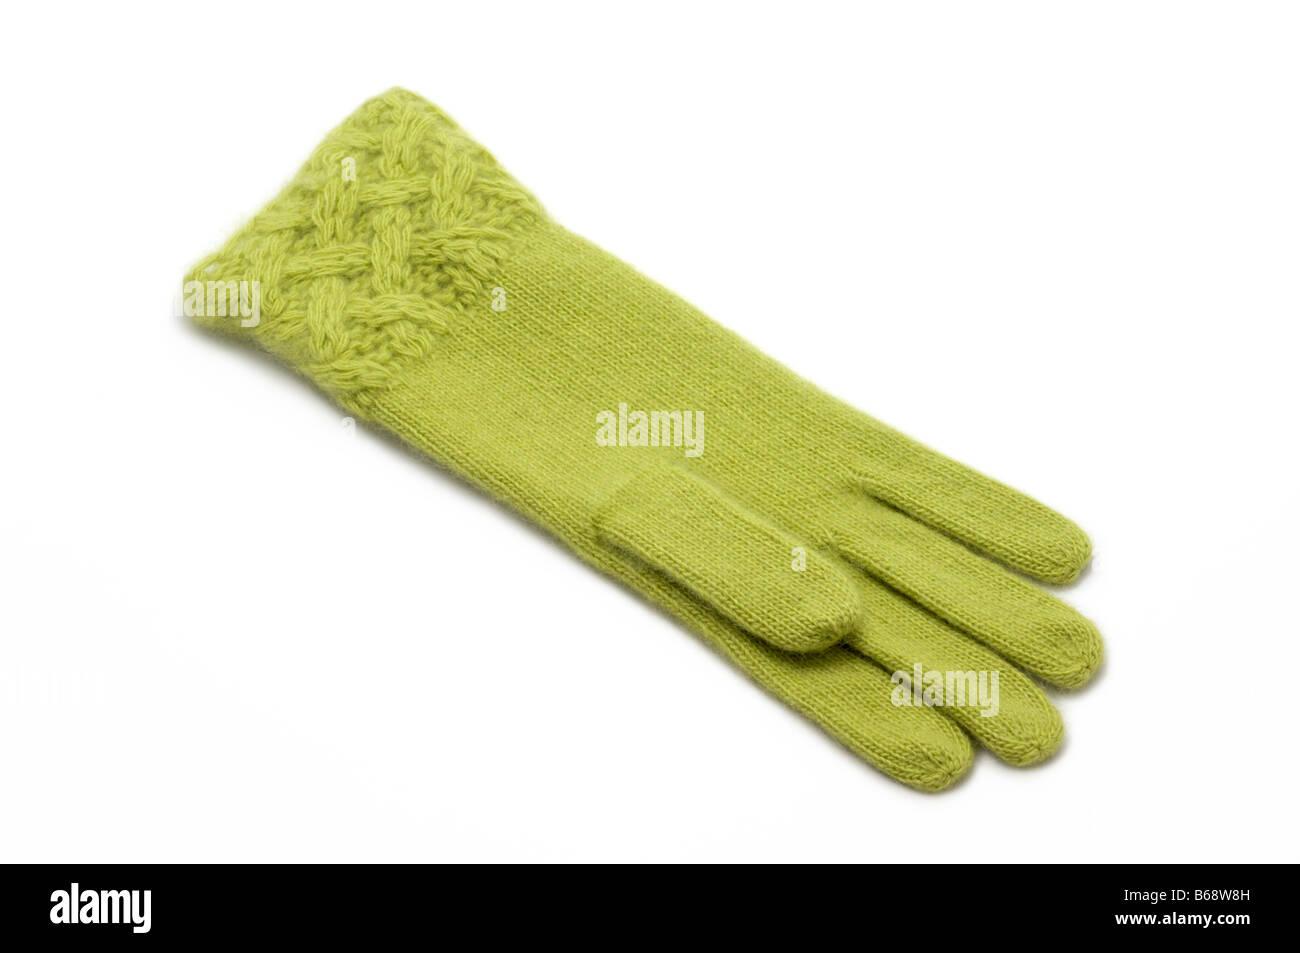 Glove - Stock Image